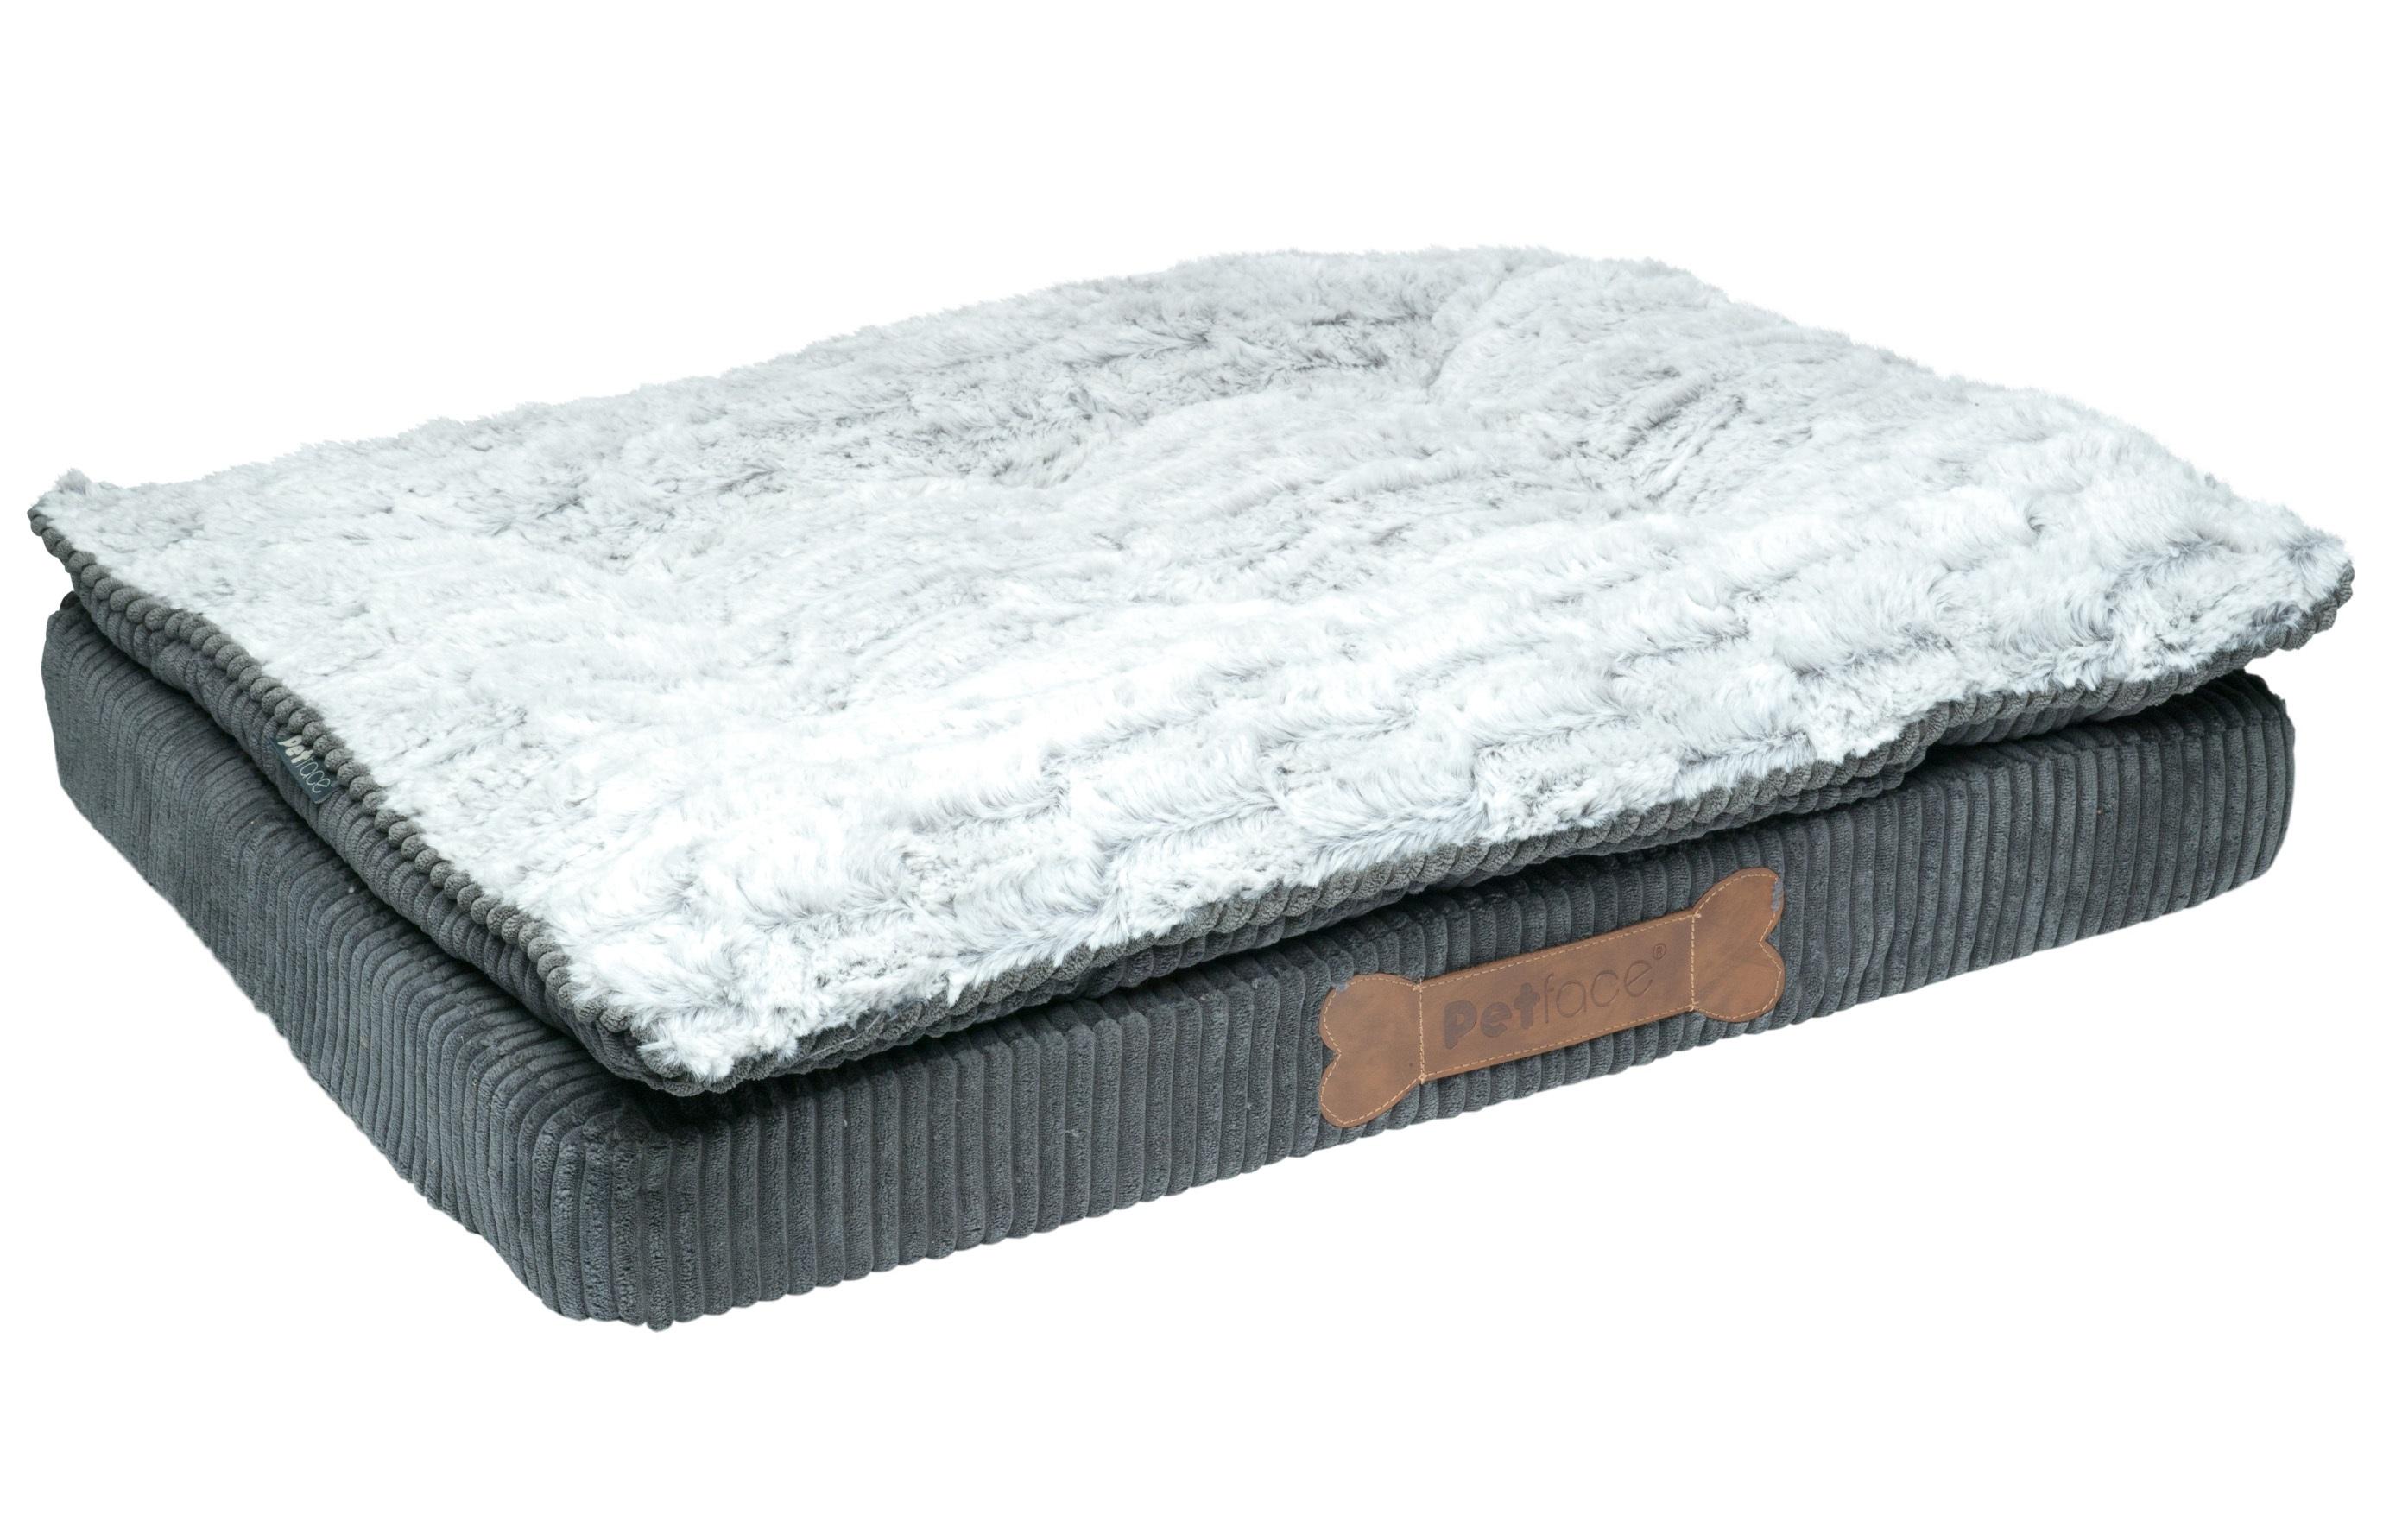 Petface Memory Foam Dog Bed Online Shopping